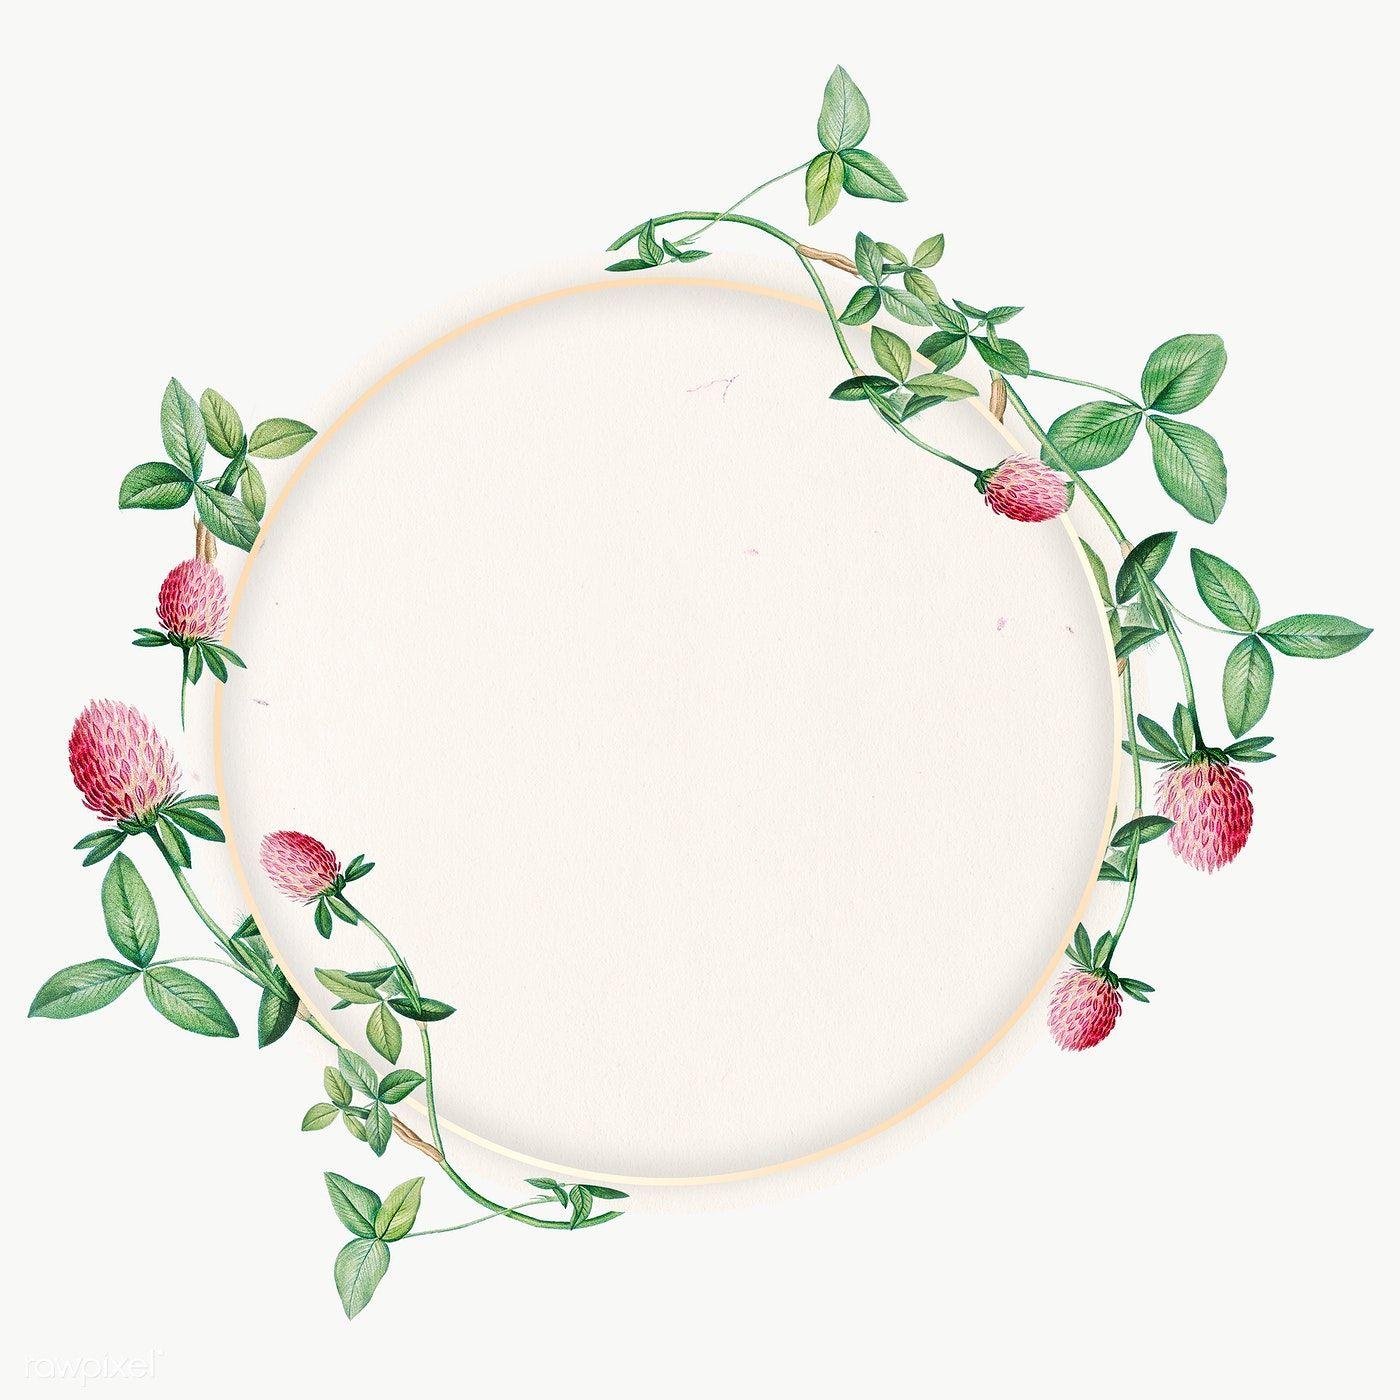 Download Premium Png Of Round Clover Flower Frame Transparent Png 2090916 In 2020 Flower Frame Flower Frame Png Clover Flower